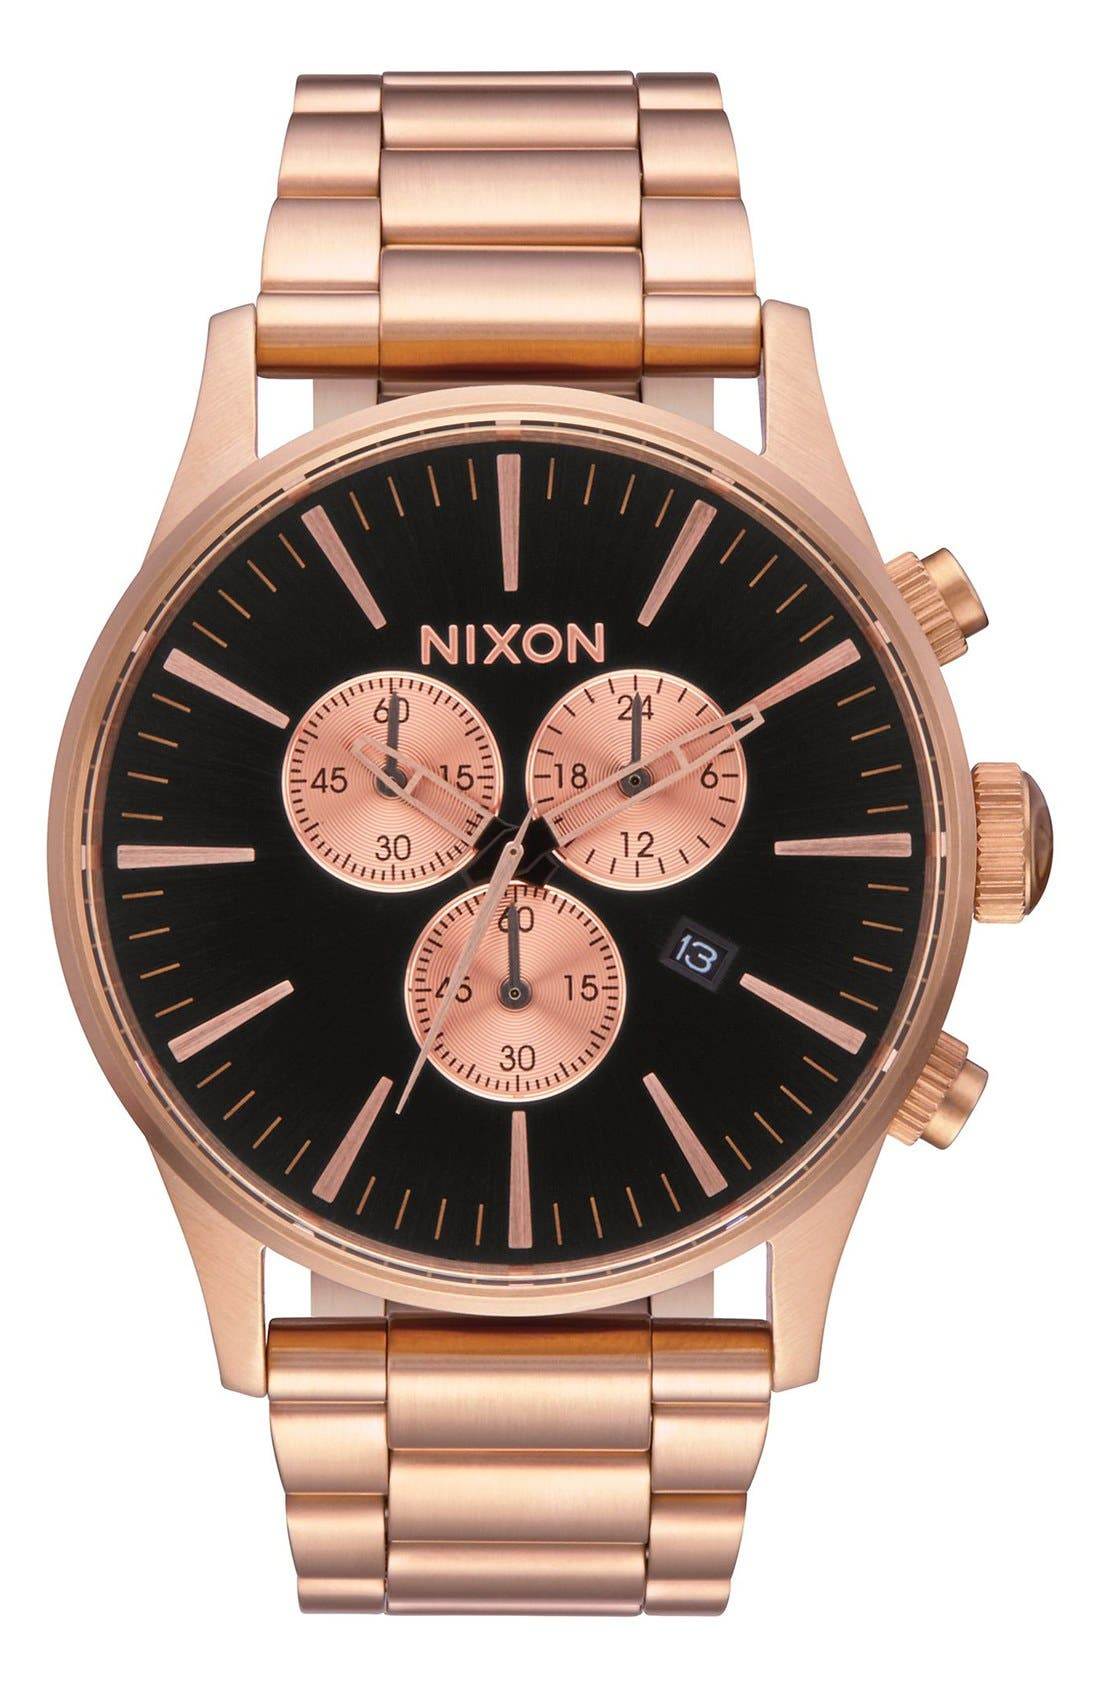 Main Image - Nixon The Sentry Chronograph Bracelet Watch, 42mm